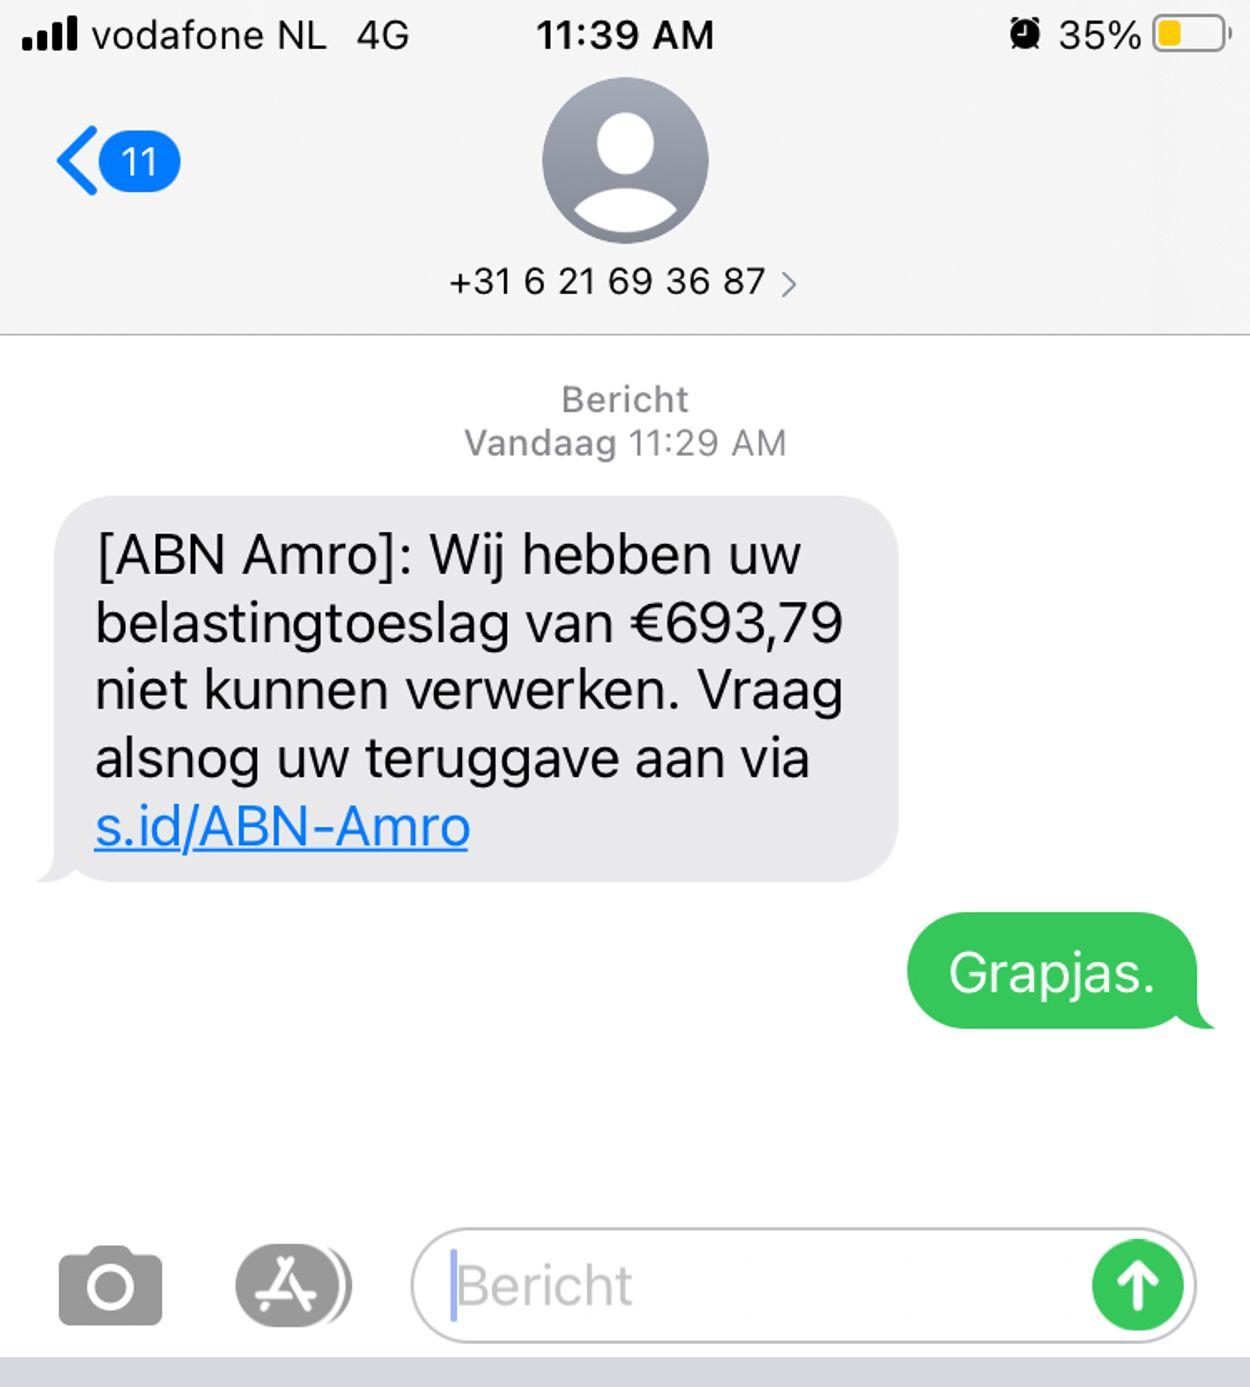 ABN AMRO phishingsms januari 2021